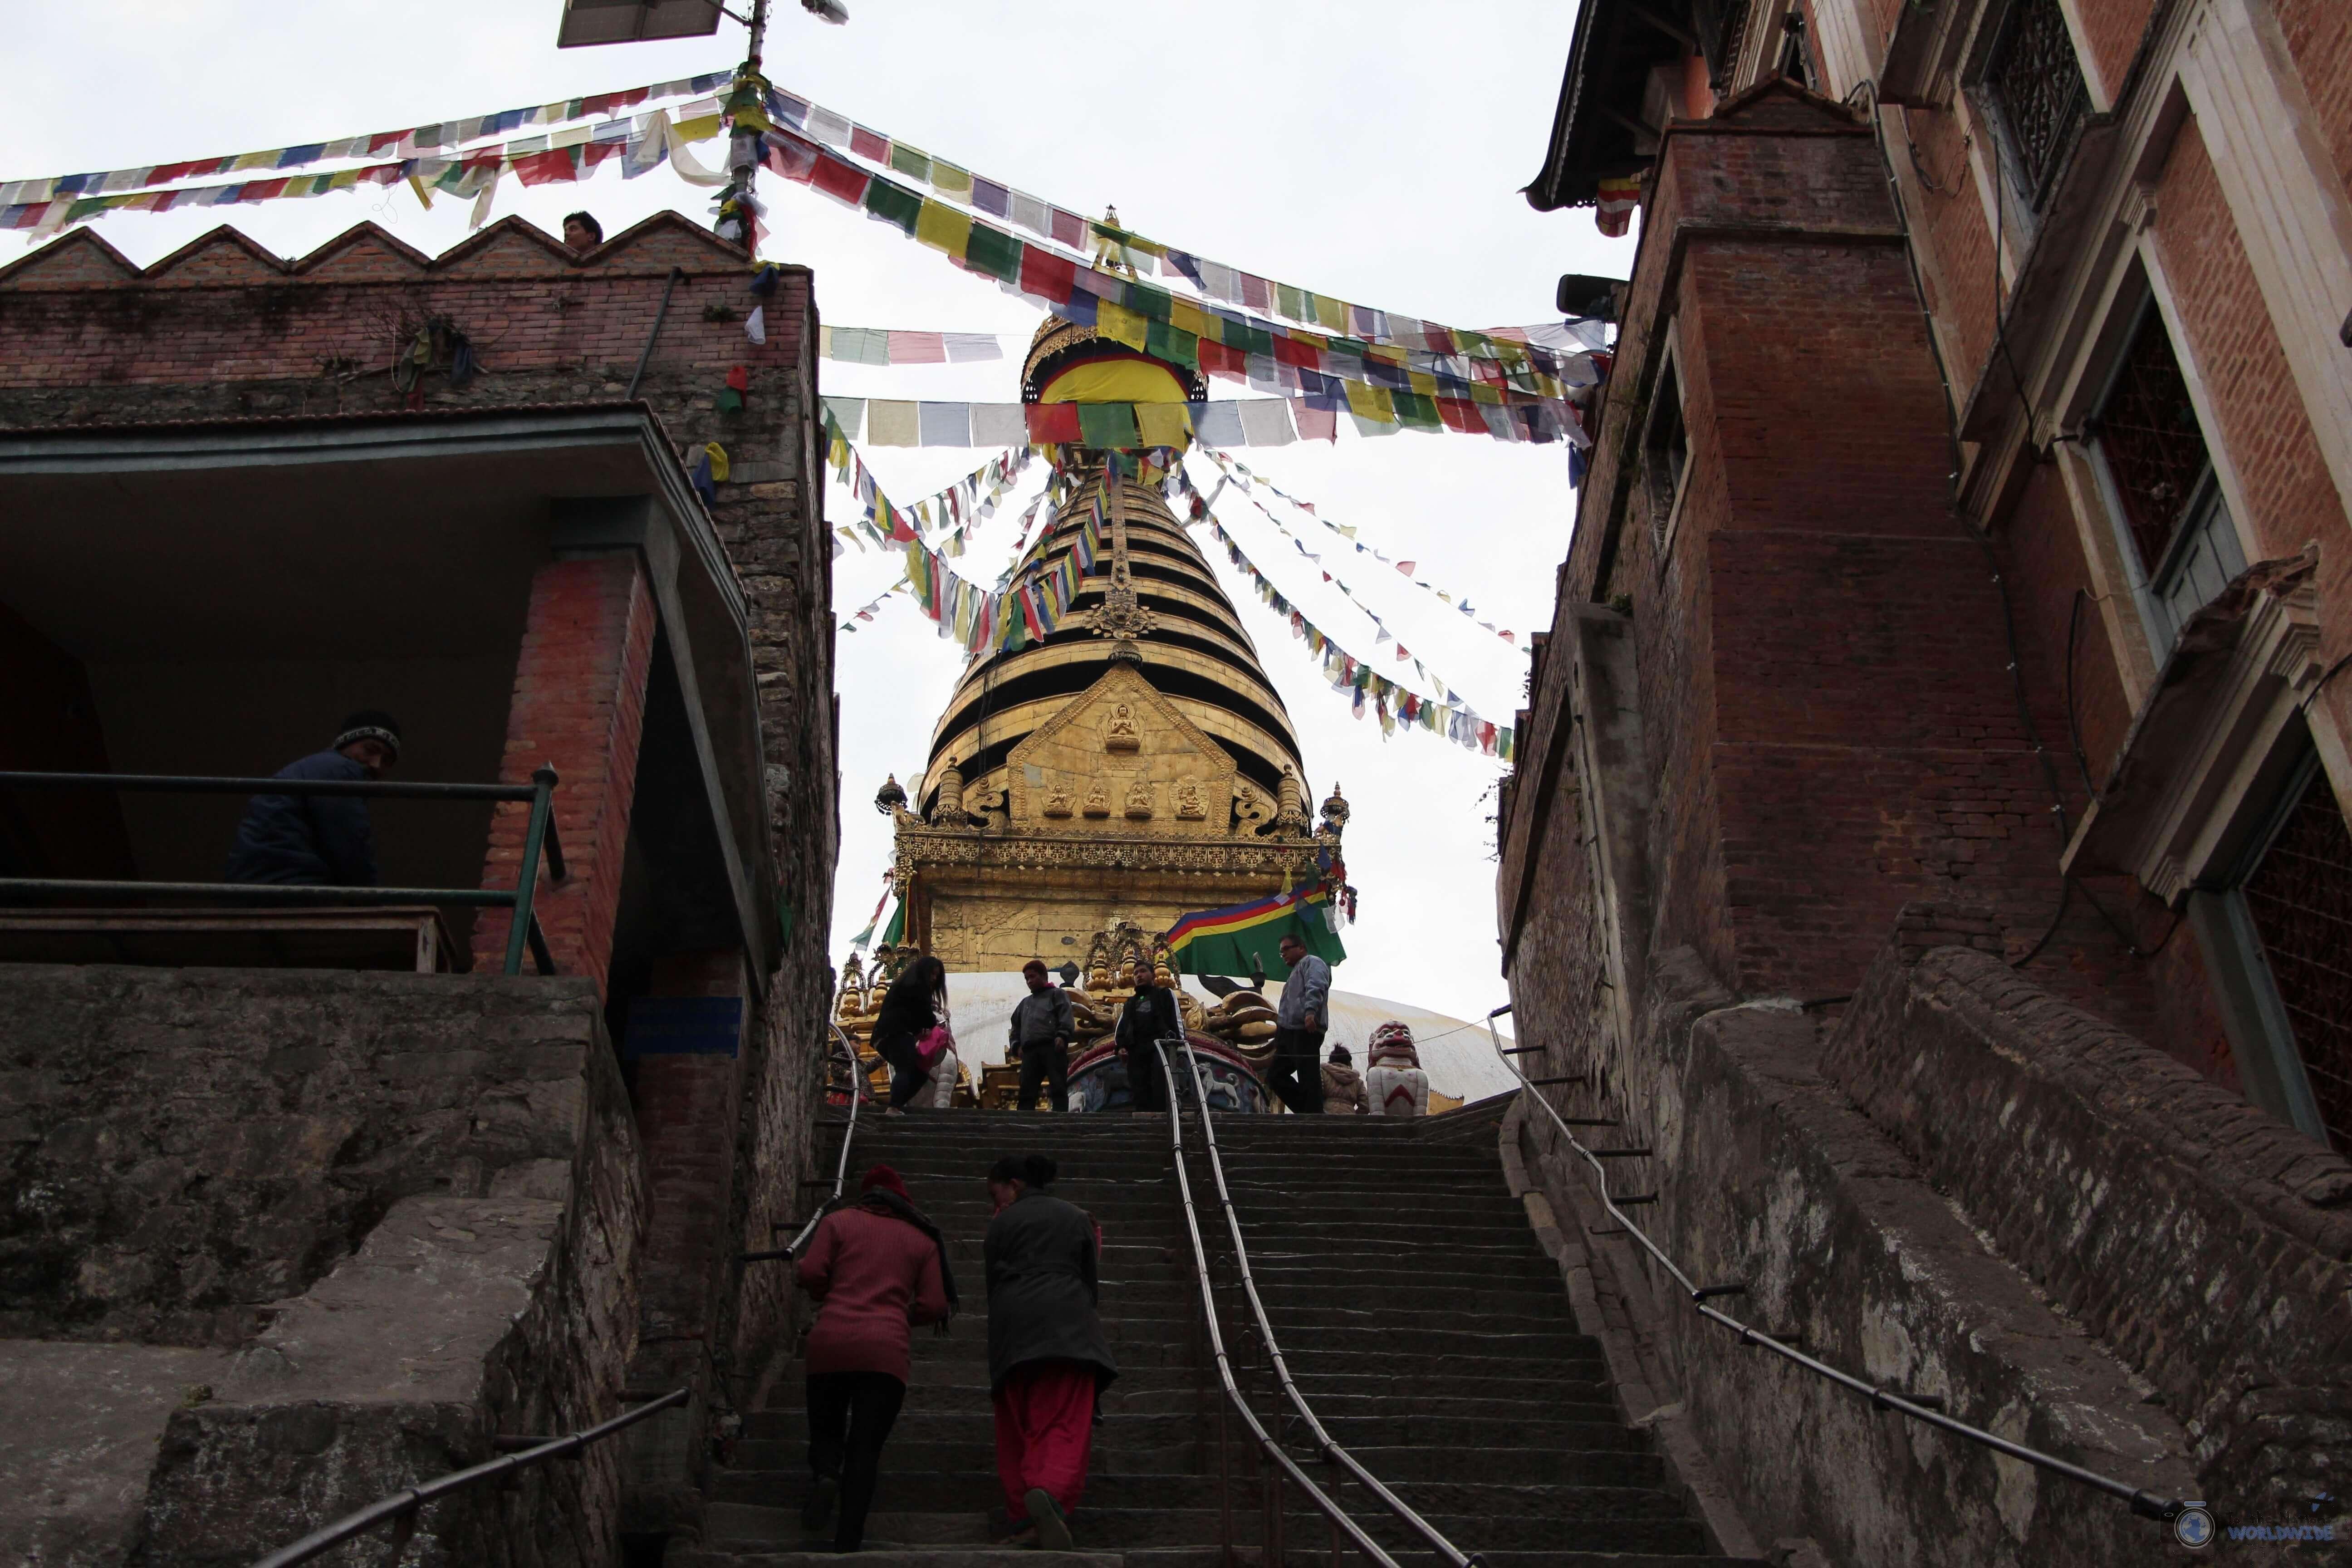 The Top of Swayambhunath Monkey Temple, Kathmandu, Nepal